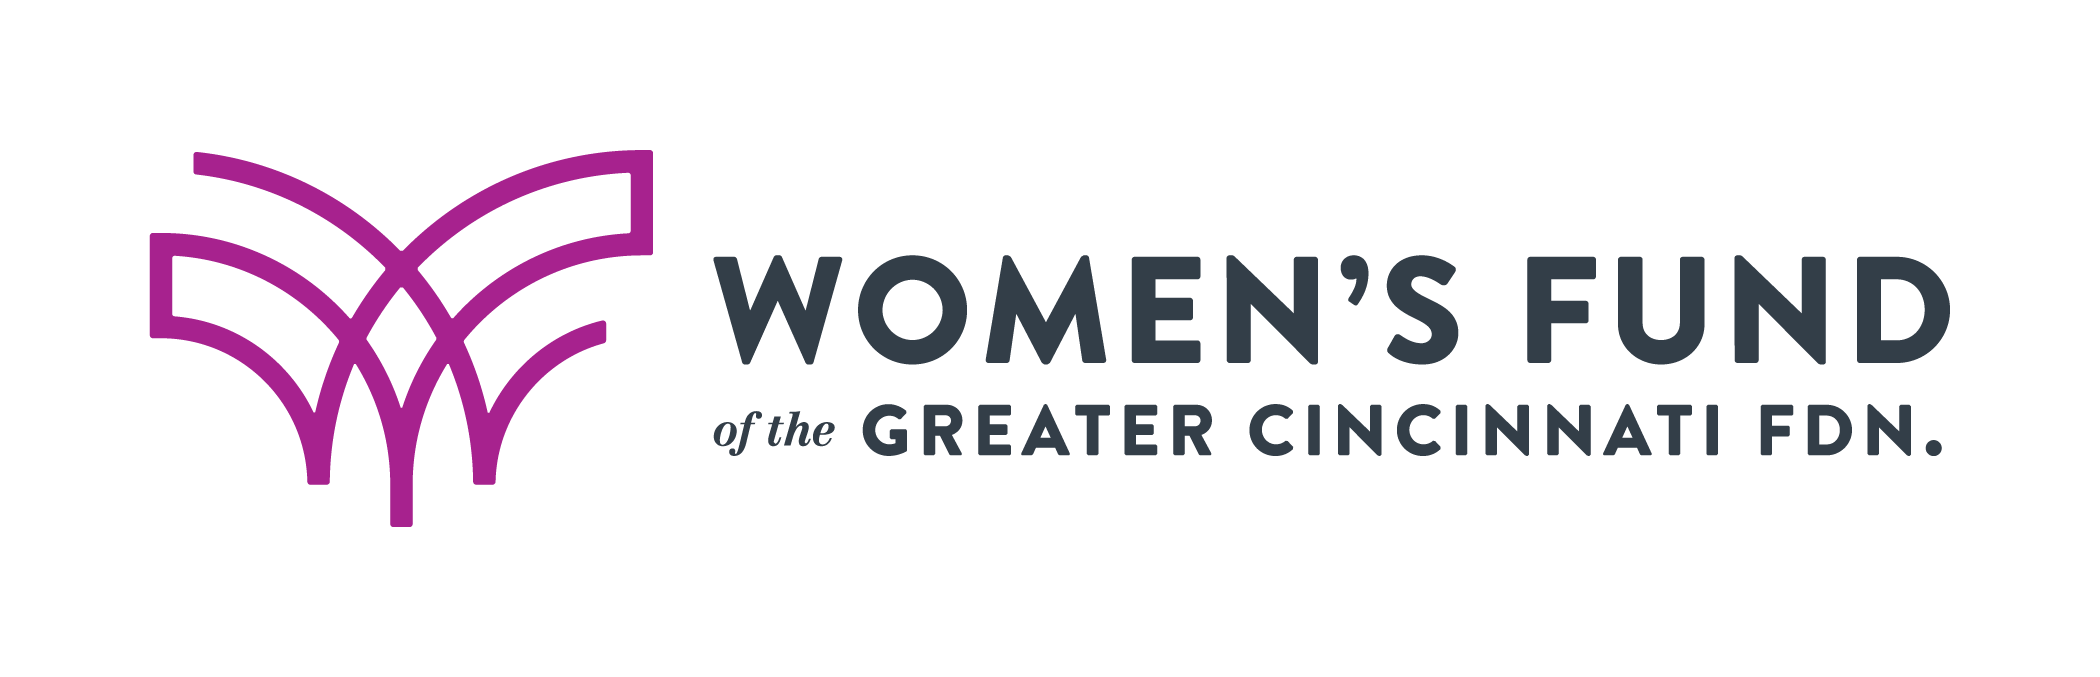 Women's Fund of the Greater Cincinnati Logo